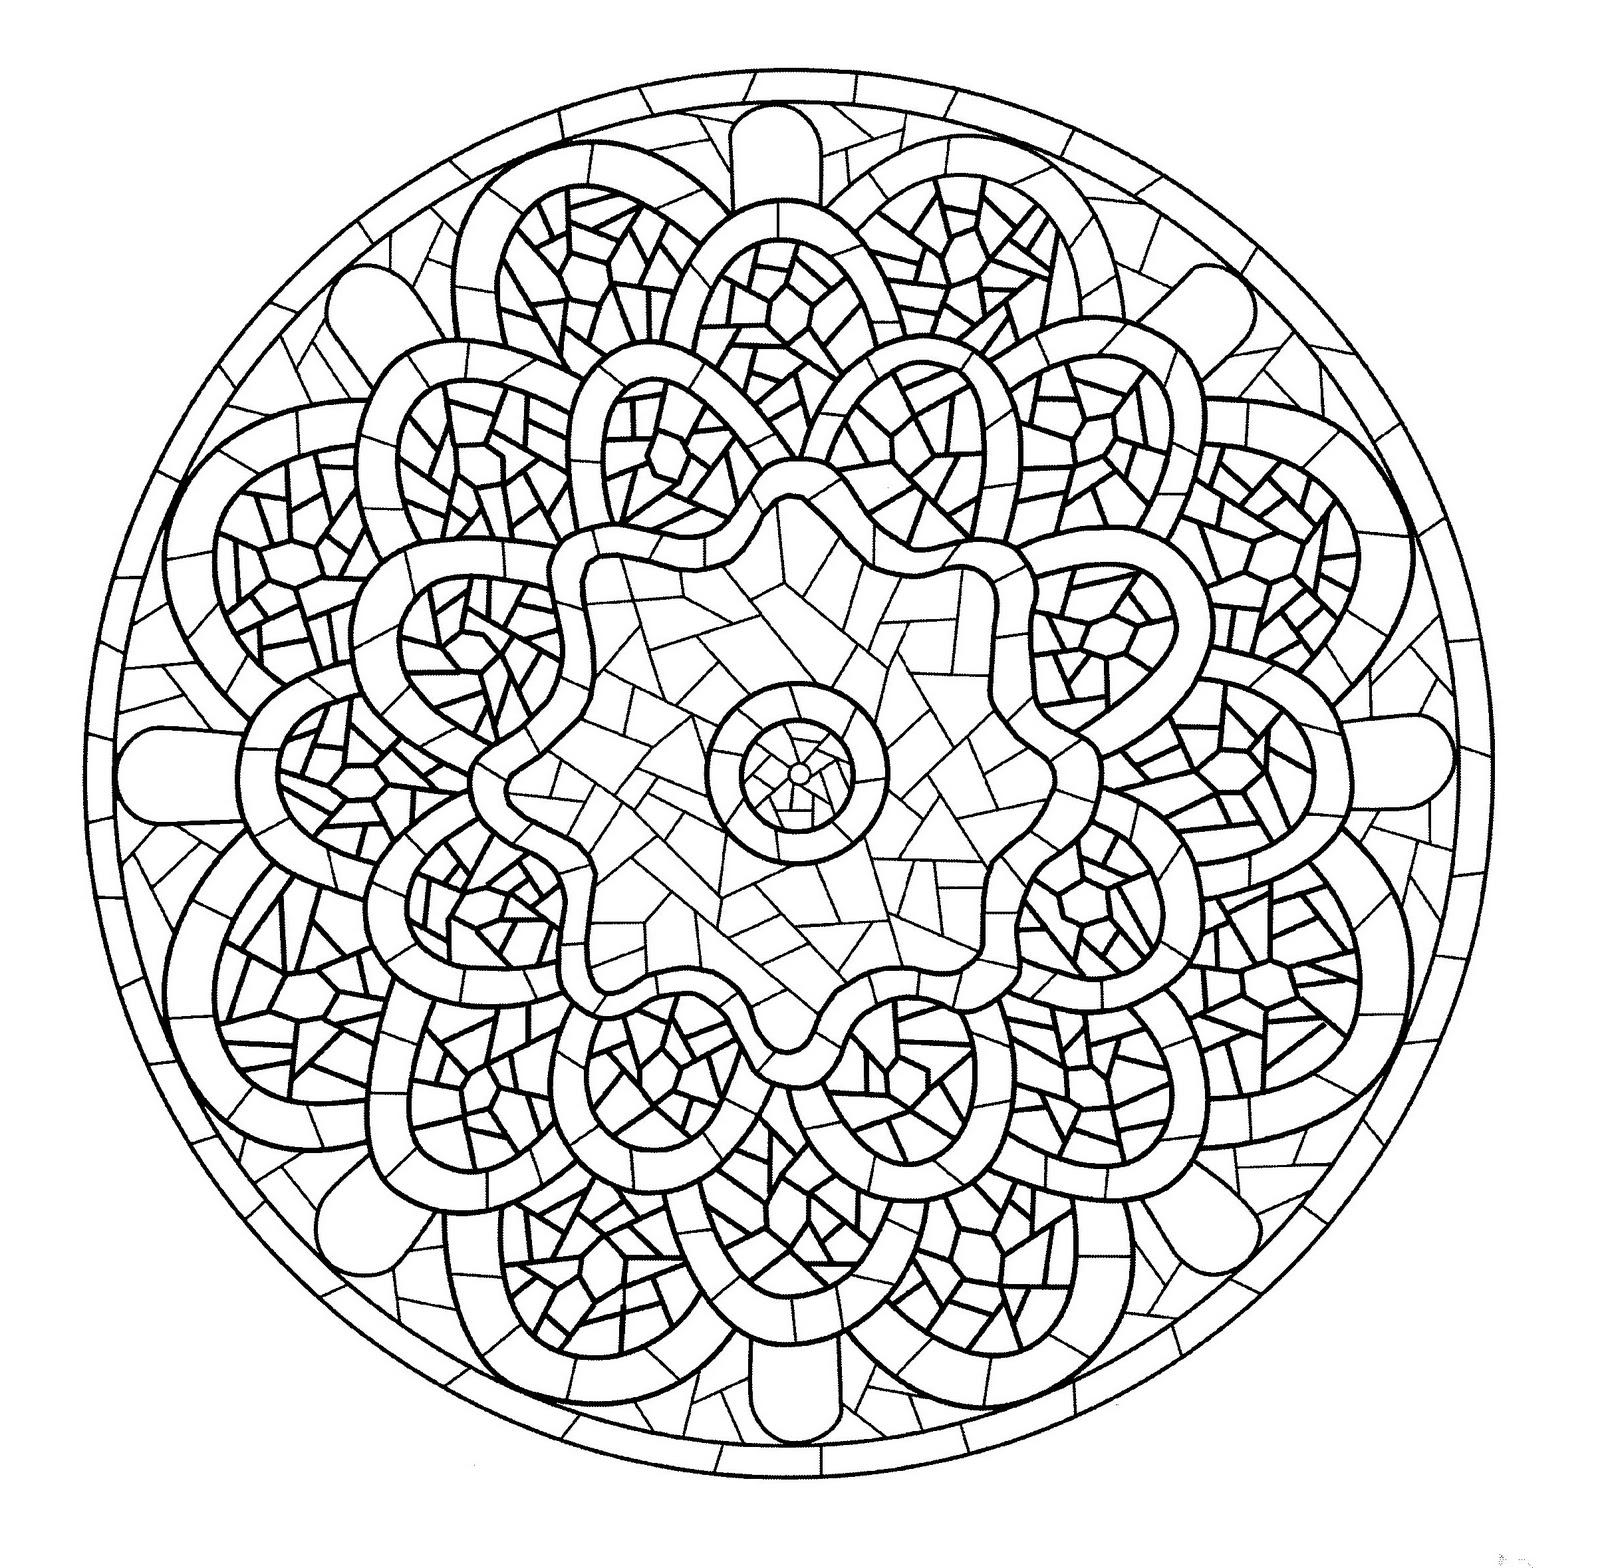 Mandala A Colorier Gratuit A Imprimer 7 – Mandalas De avec Image A Colorier Gratuit A Imprimer